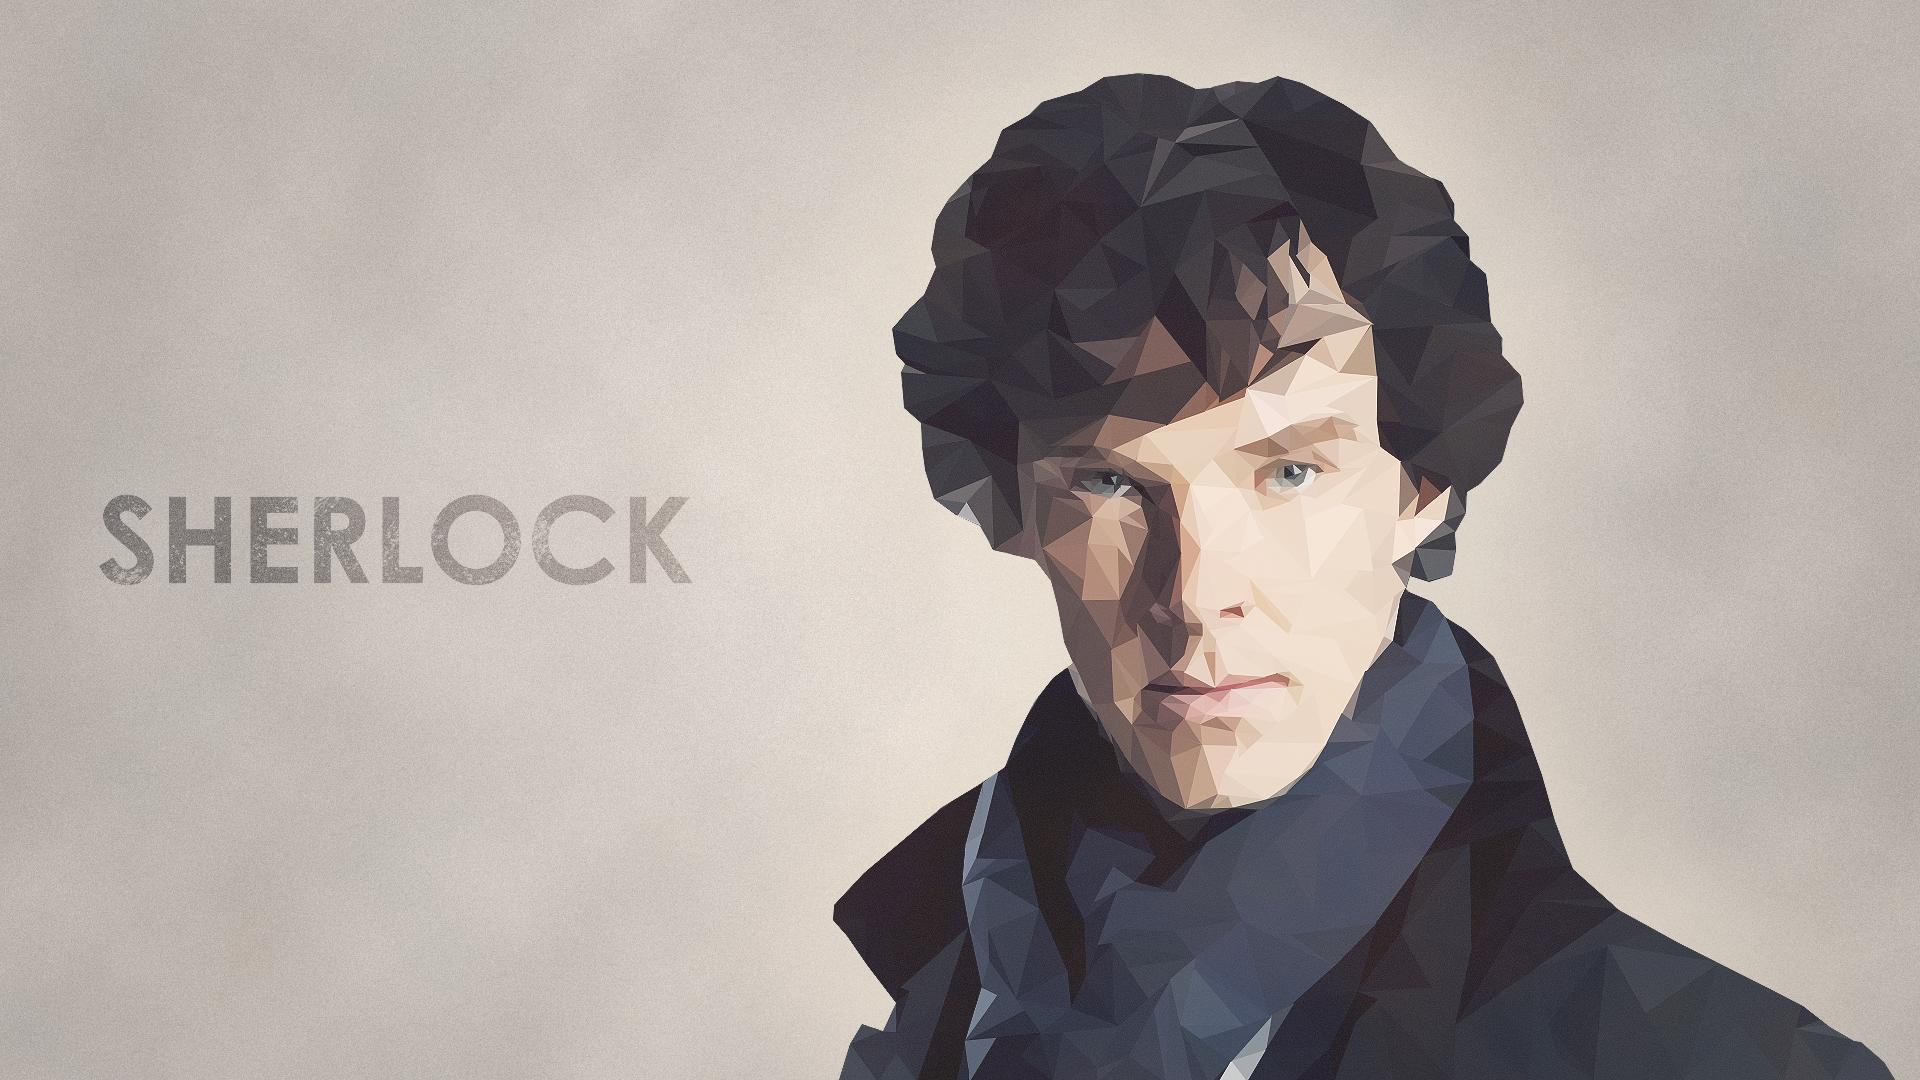 Sherlock low poly wallpaper